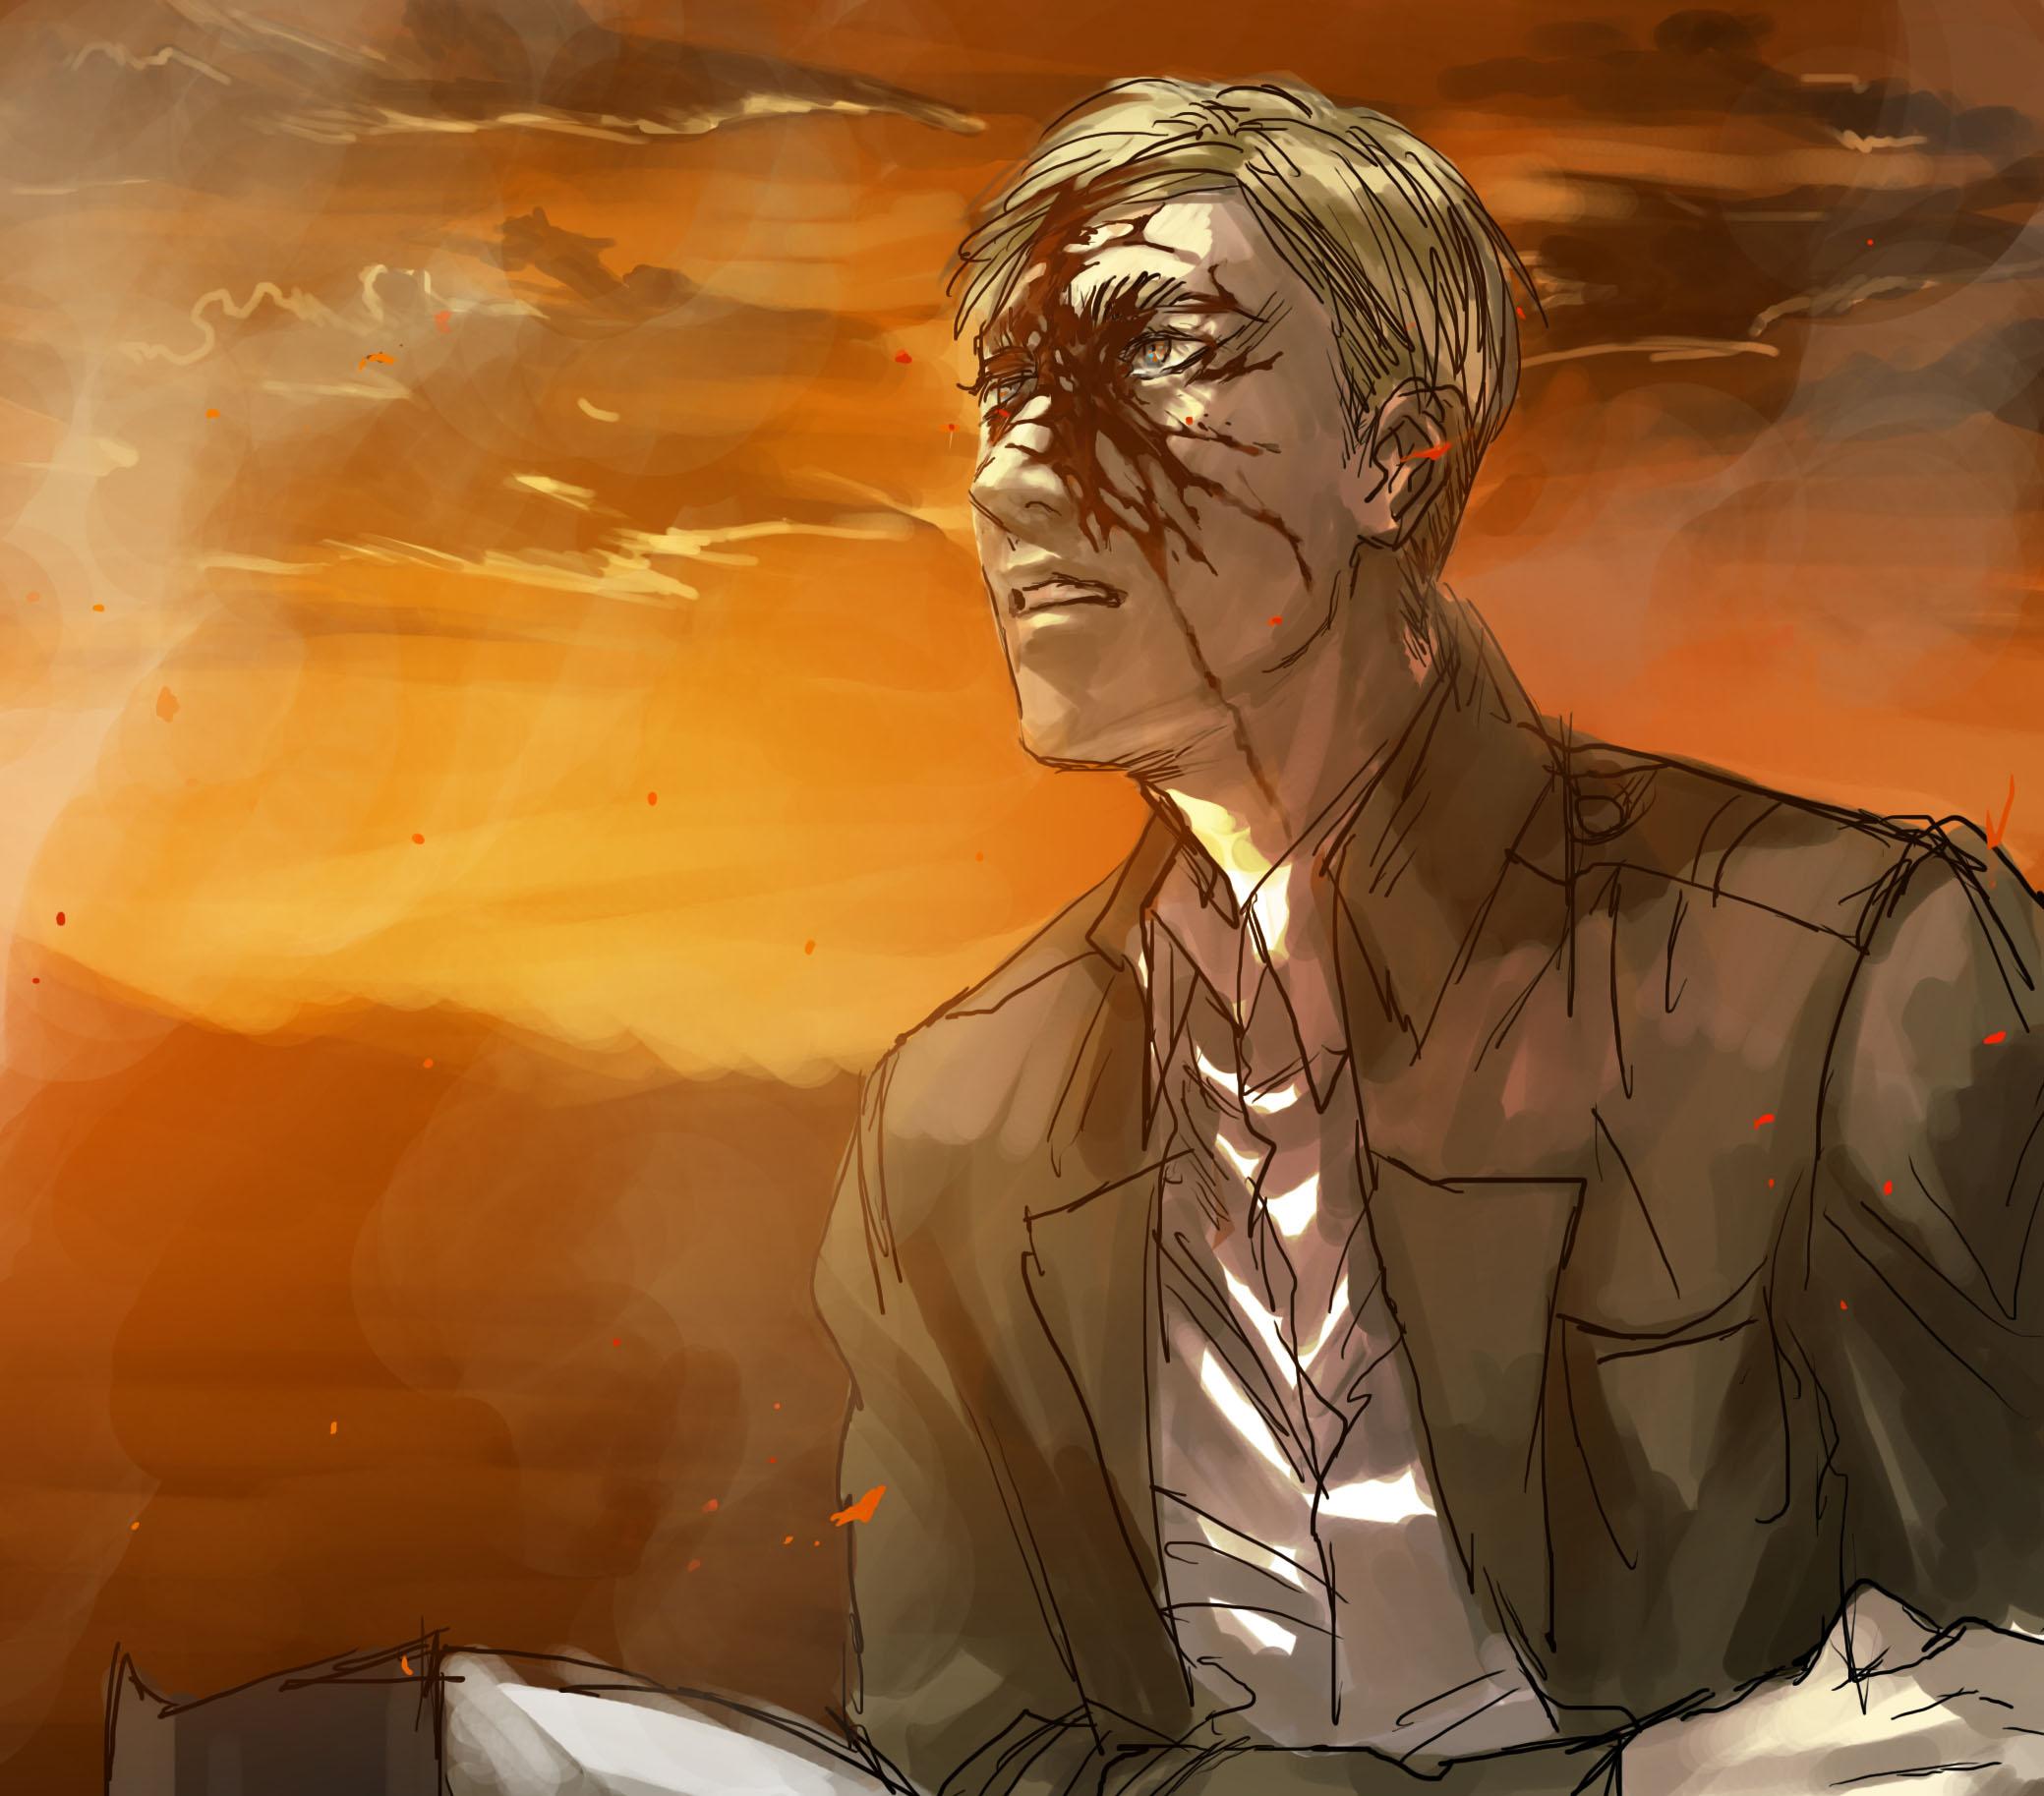 Erwin Smith - Attack on Titan - Image #2140430 - Zerochan Anime Image Board